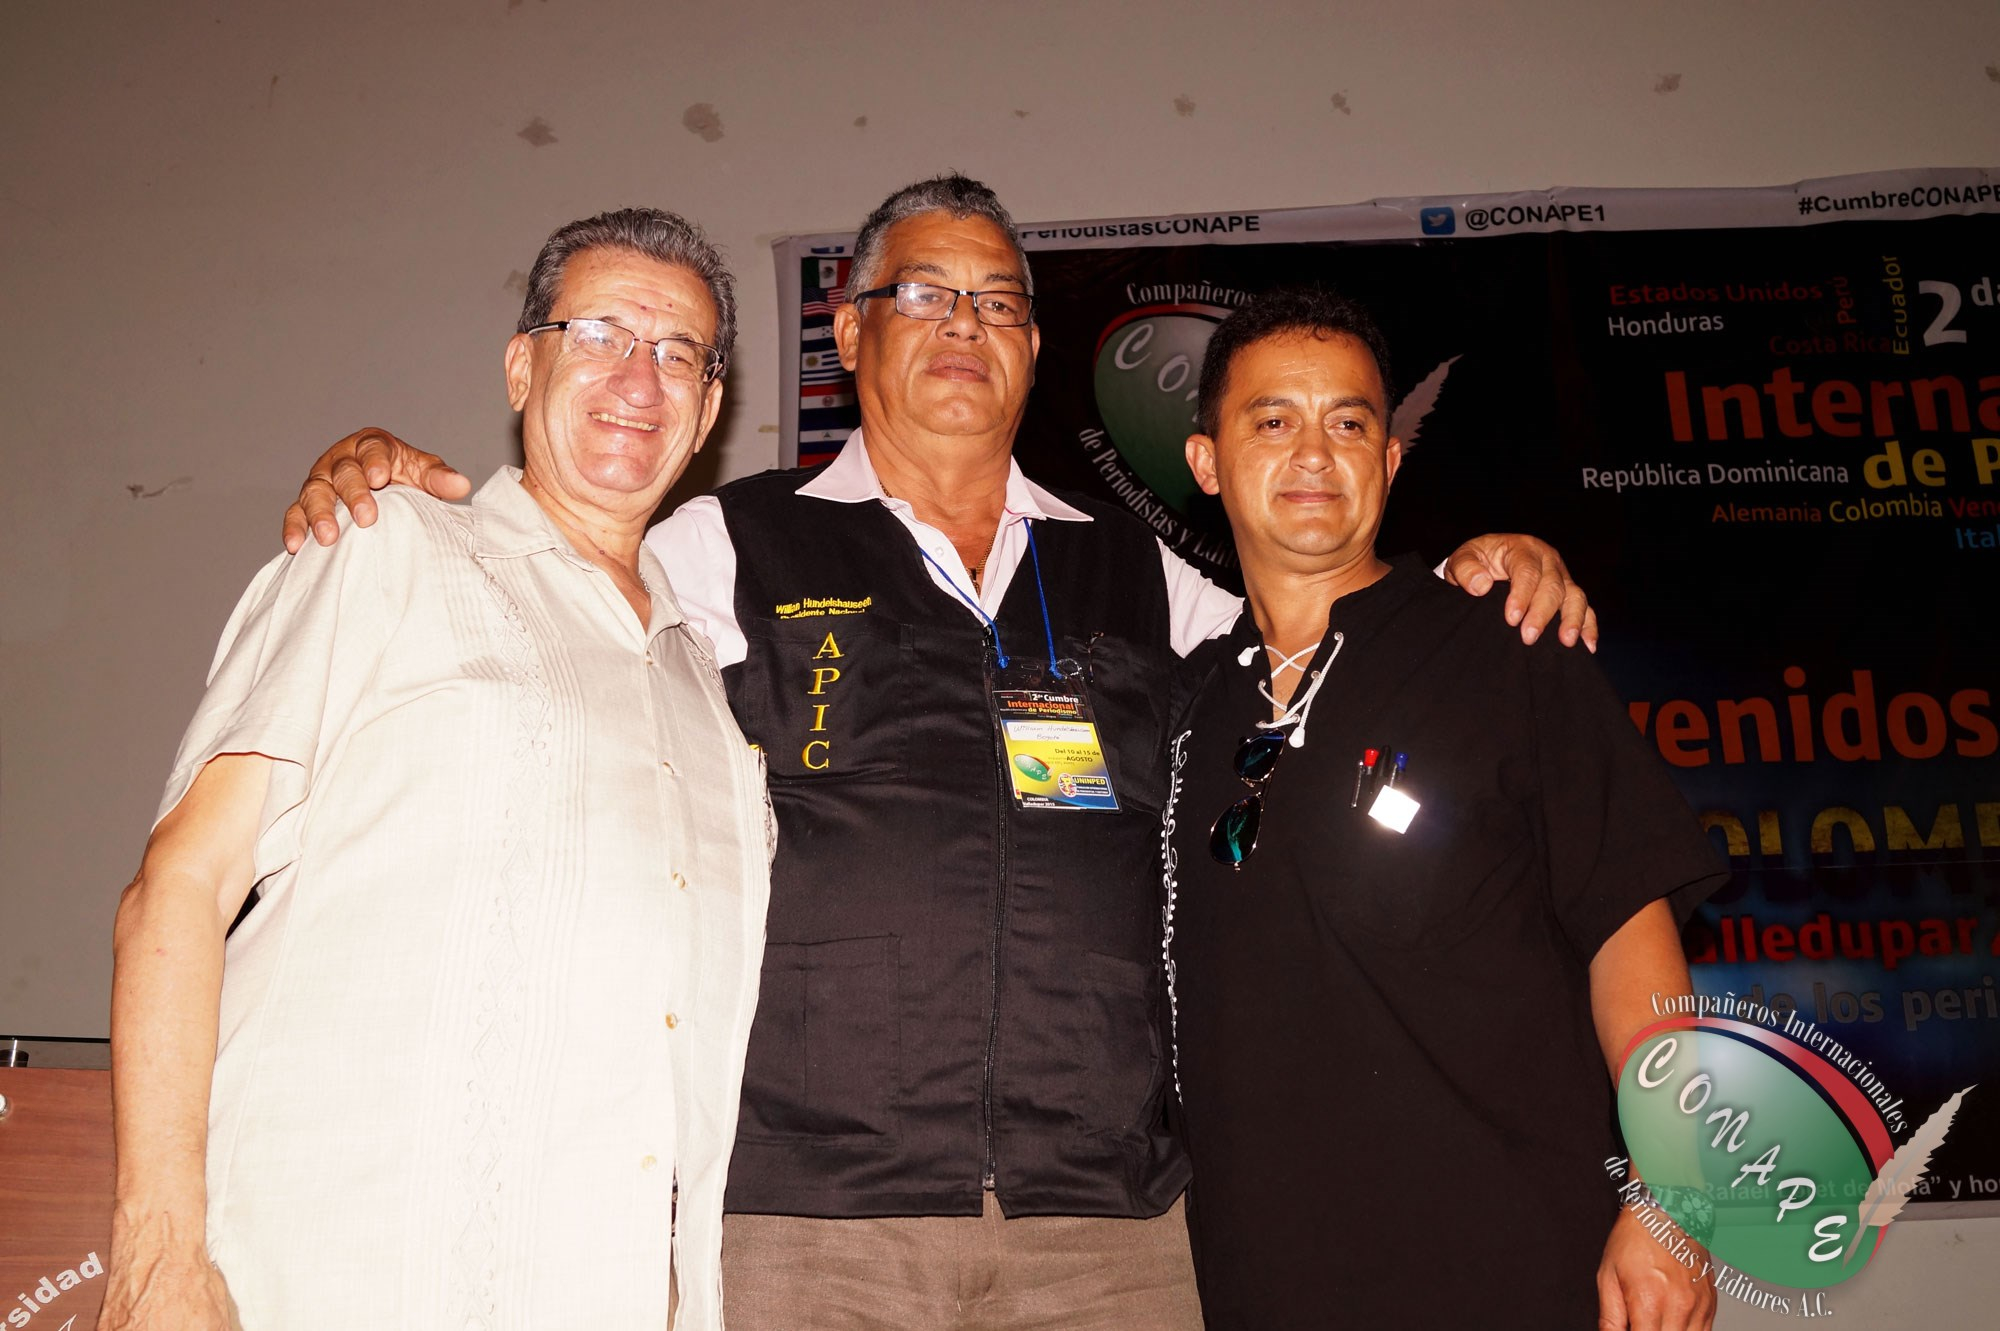 2da CUMBRE INTERNACIONAL DE PERIODISMO, VALLEDUPAR, COLOMBIA 2015 - CONAPE (446)